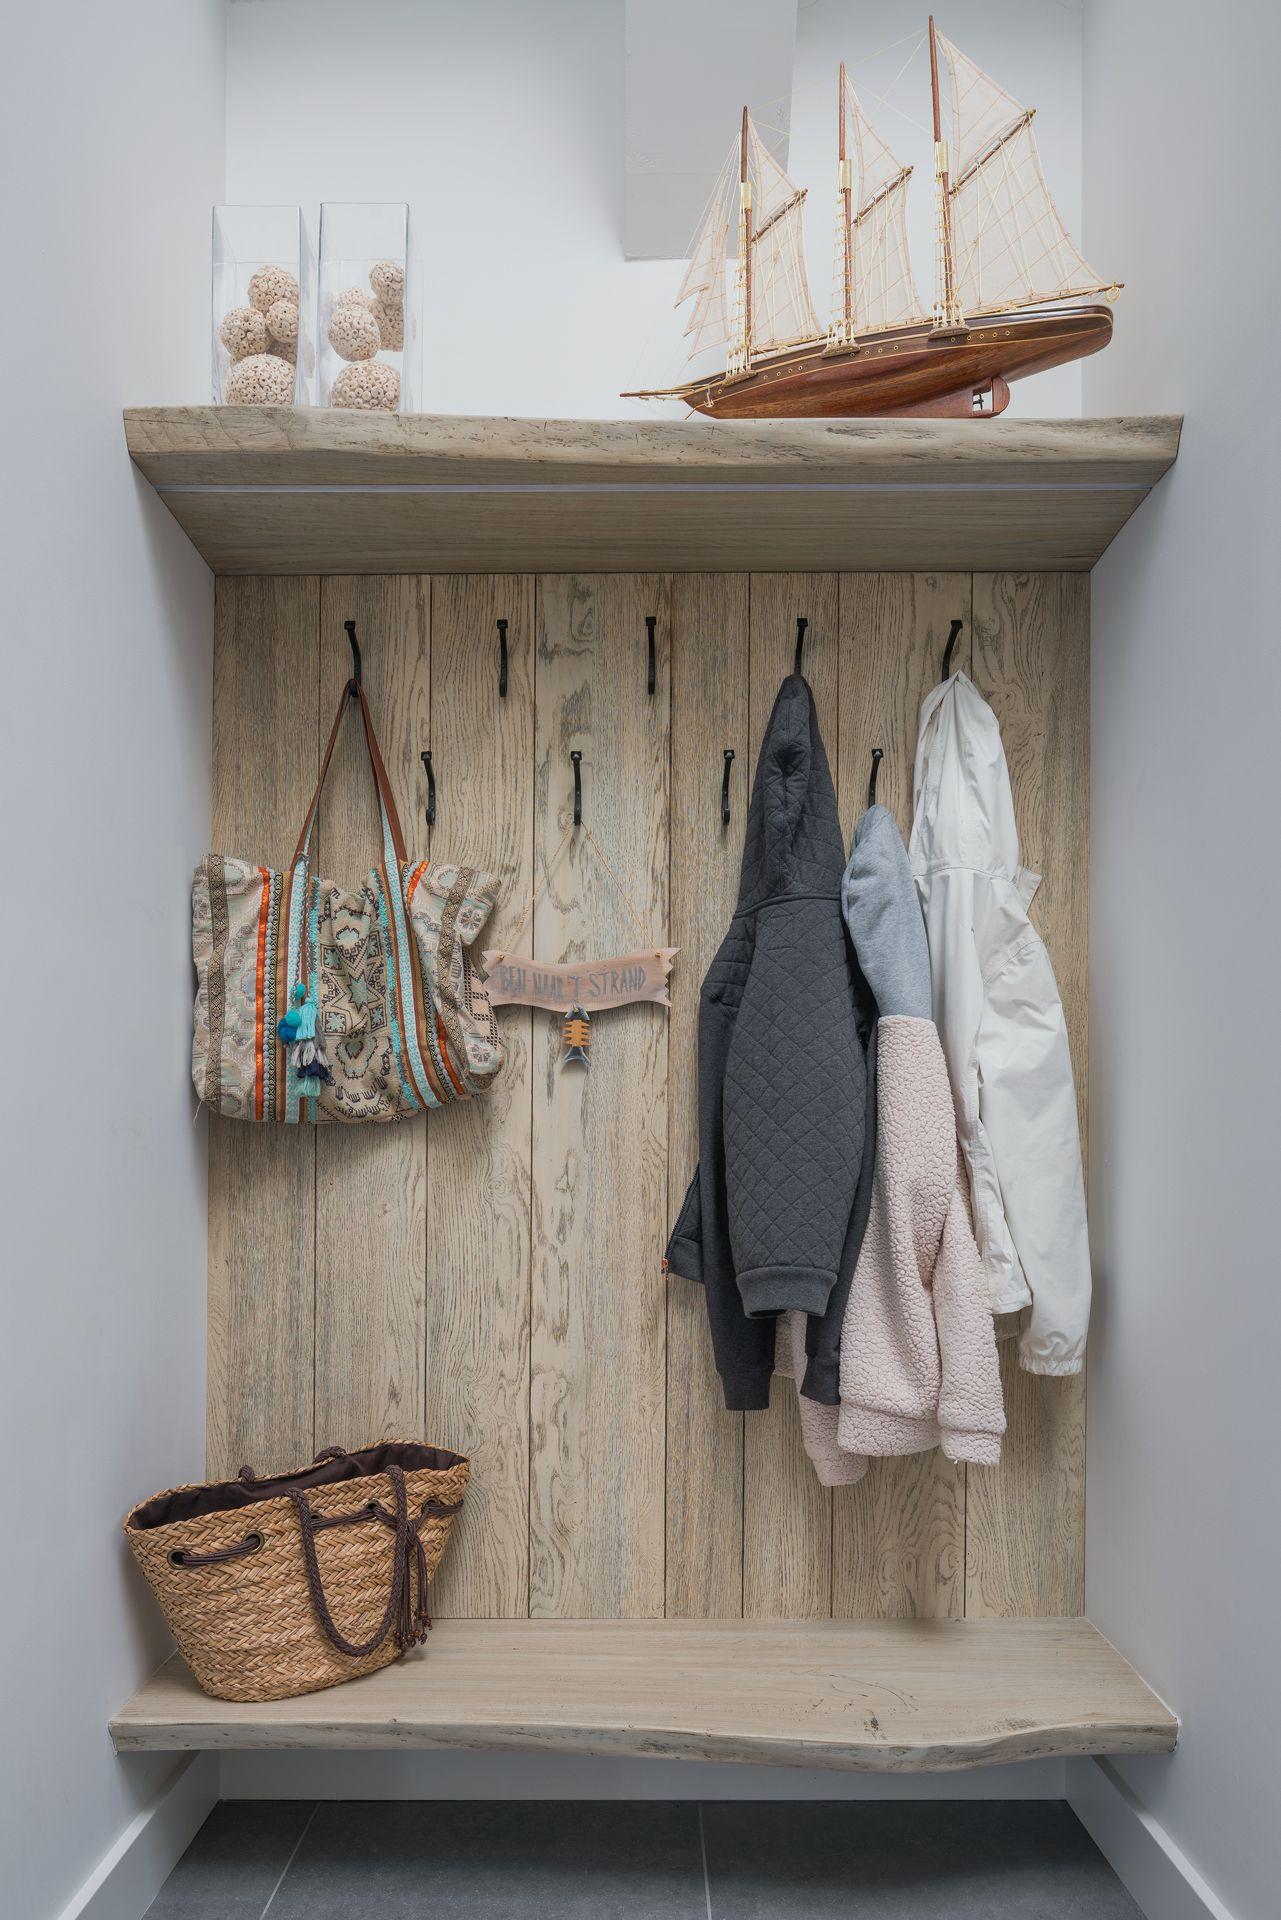 garderobe-kapstok-hout.jpg (1281×1920)